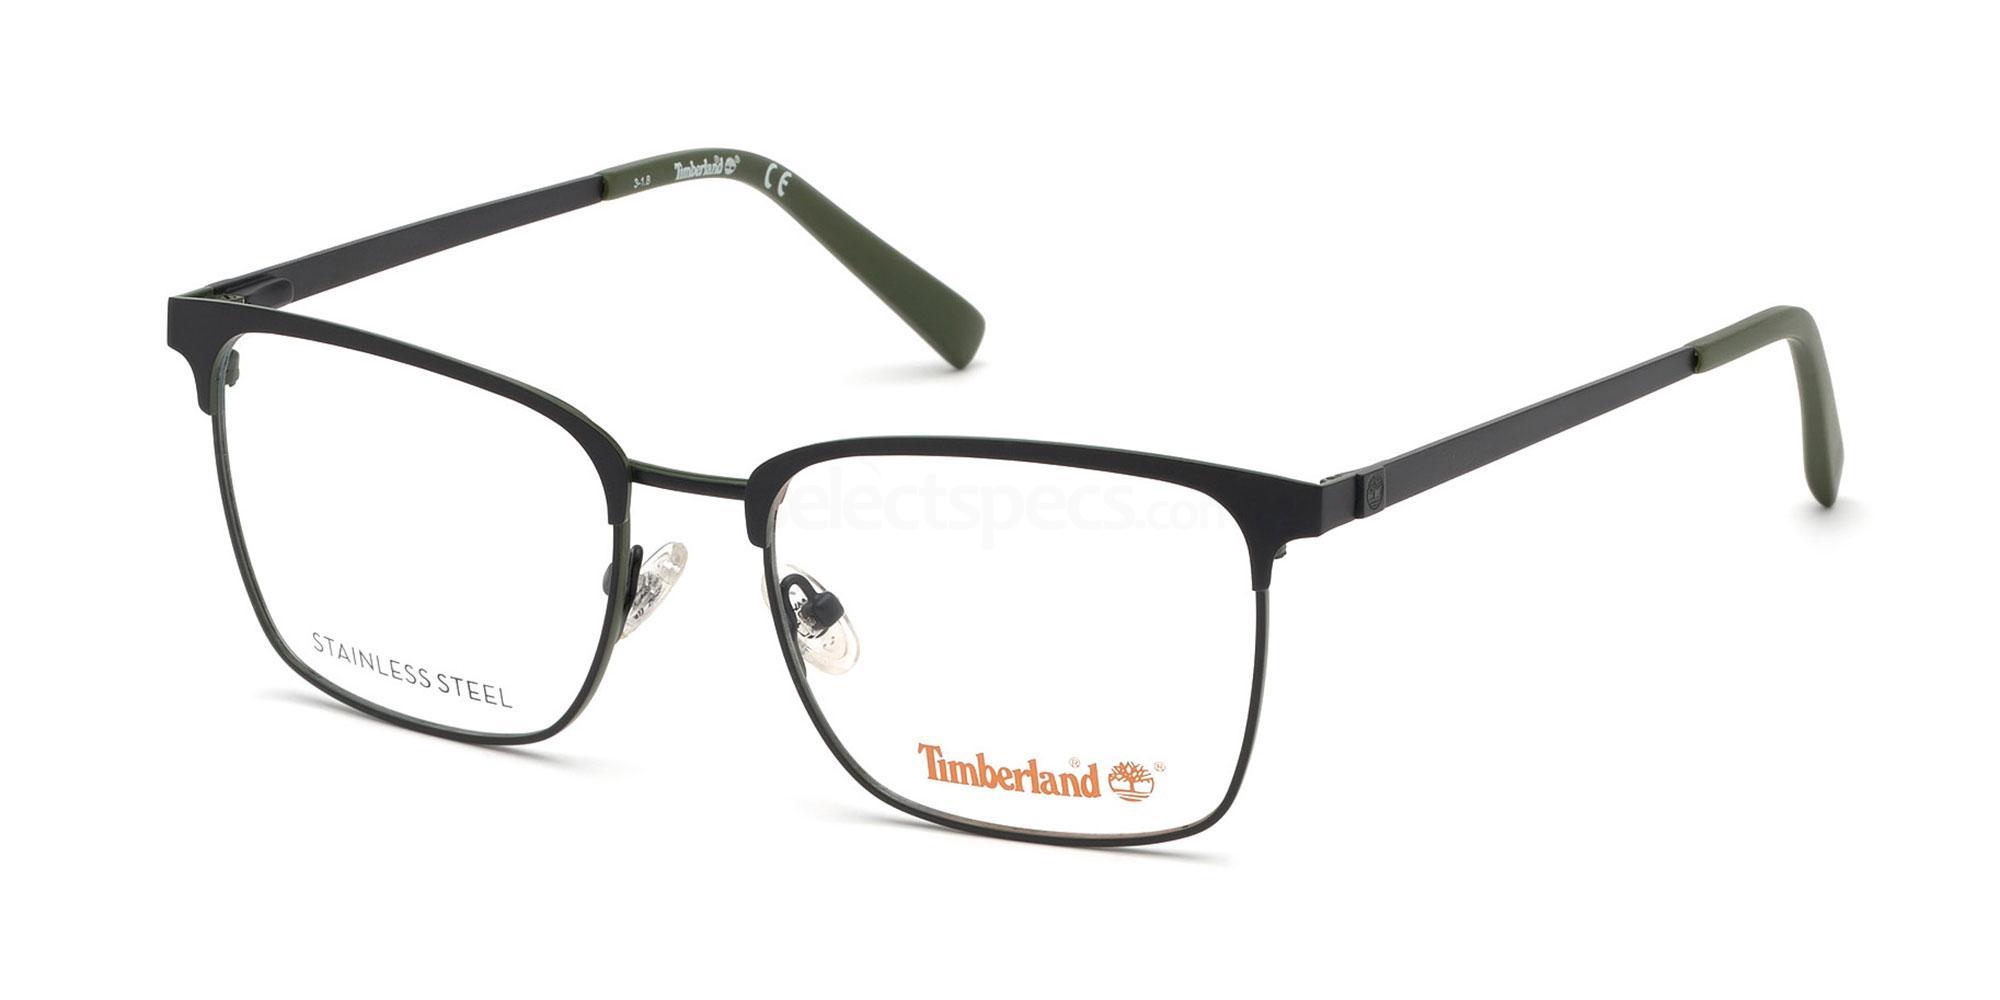 002 TB1612 Glasses, Timberland